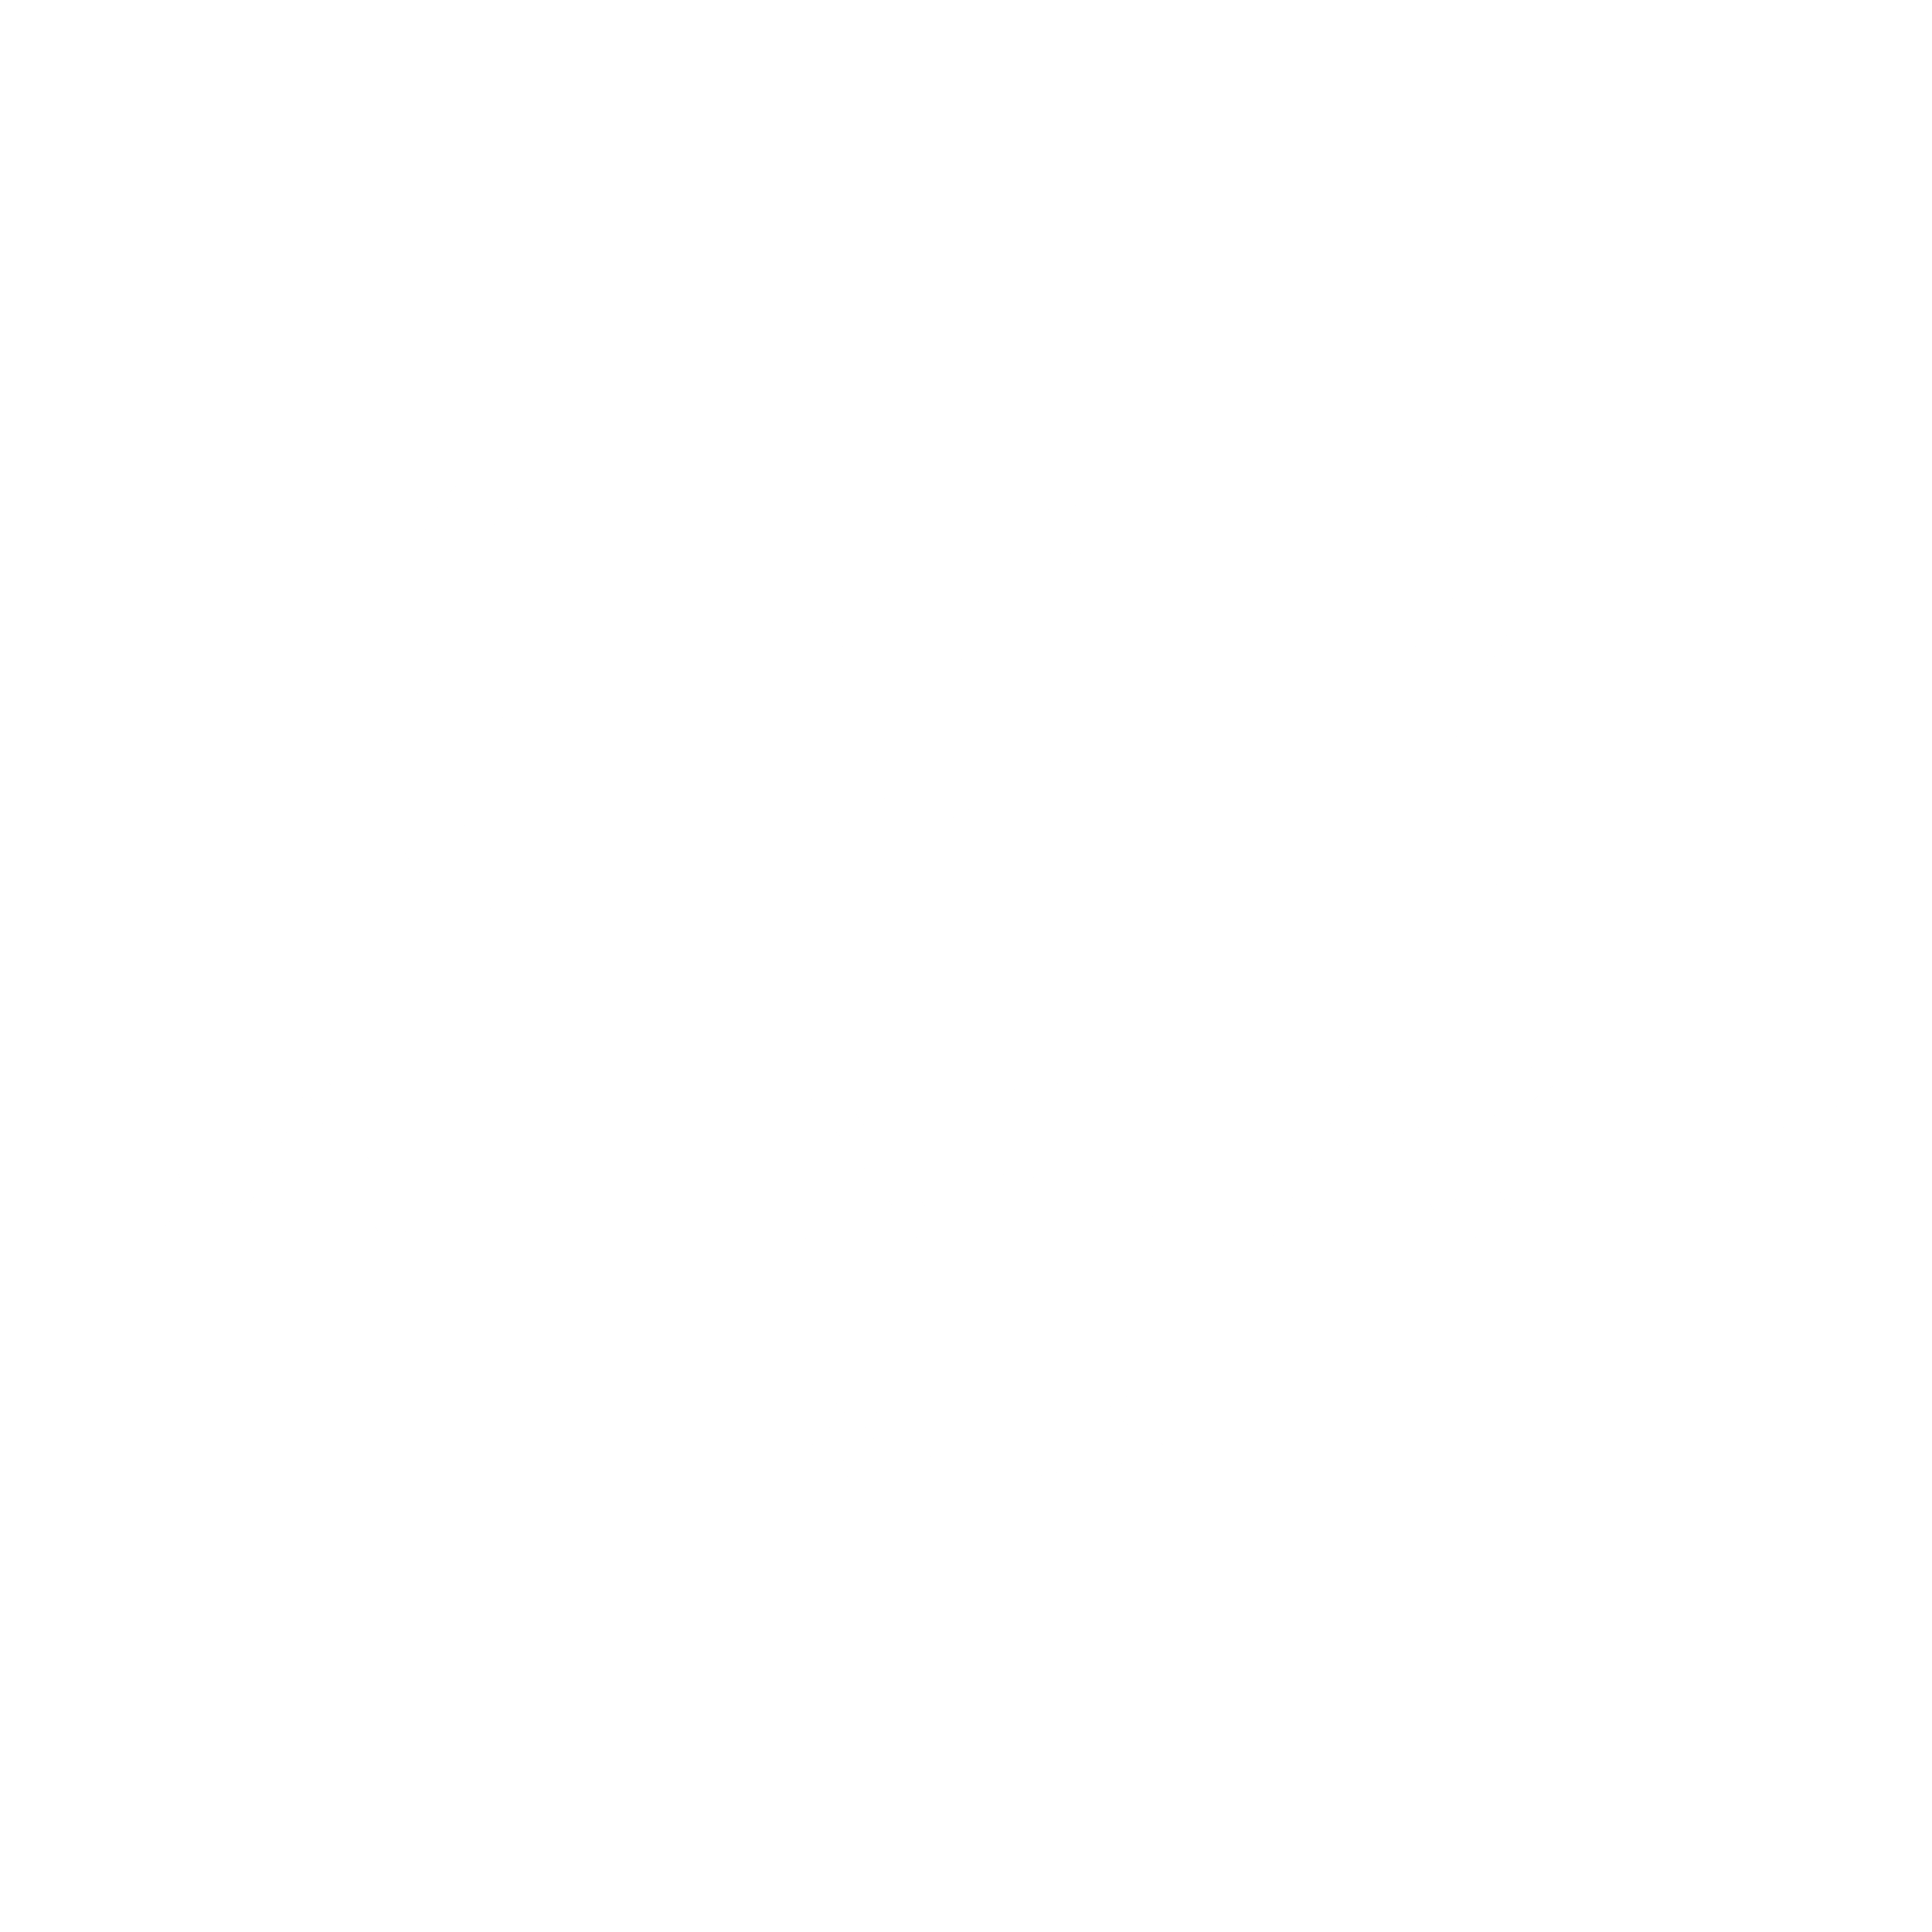 Balenciaga Logo PNG Transparent & SVG Vector.